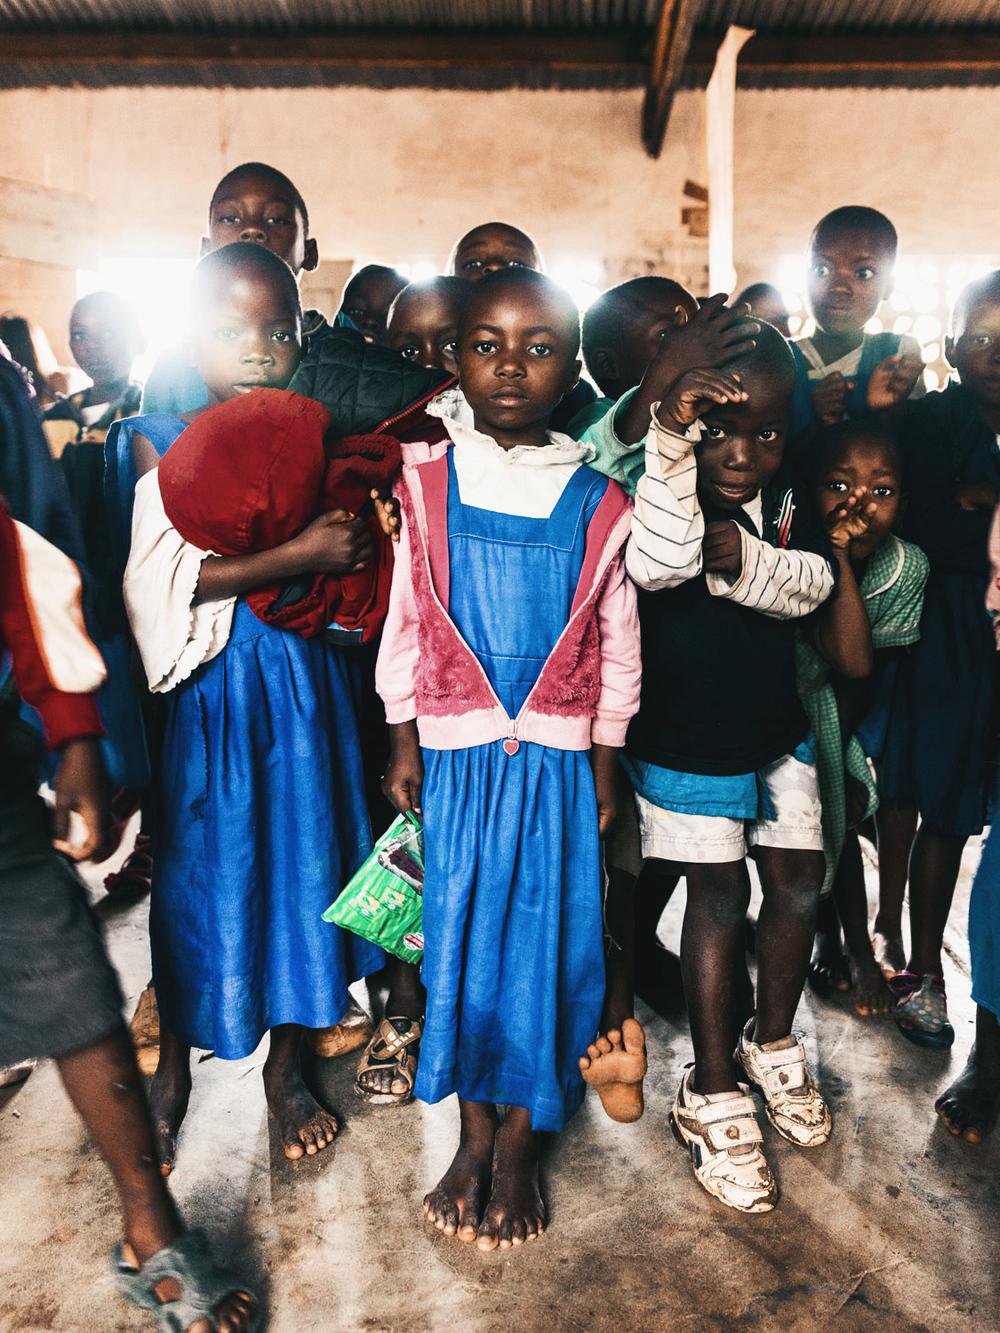 CallieGiovanna_Africa_Malawi_KandeBeach_20150101_05891.jpg